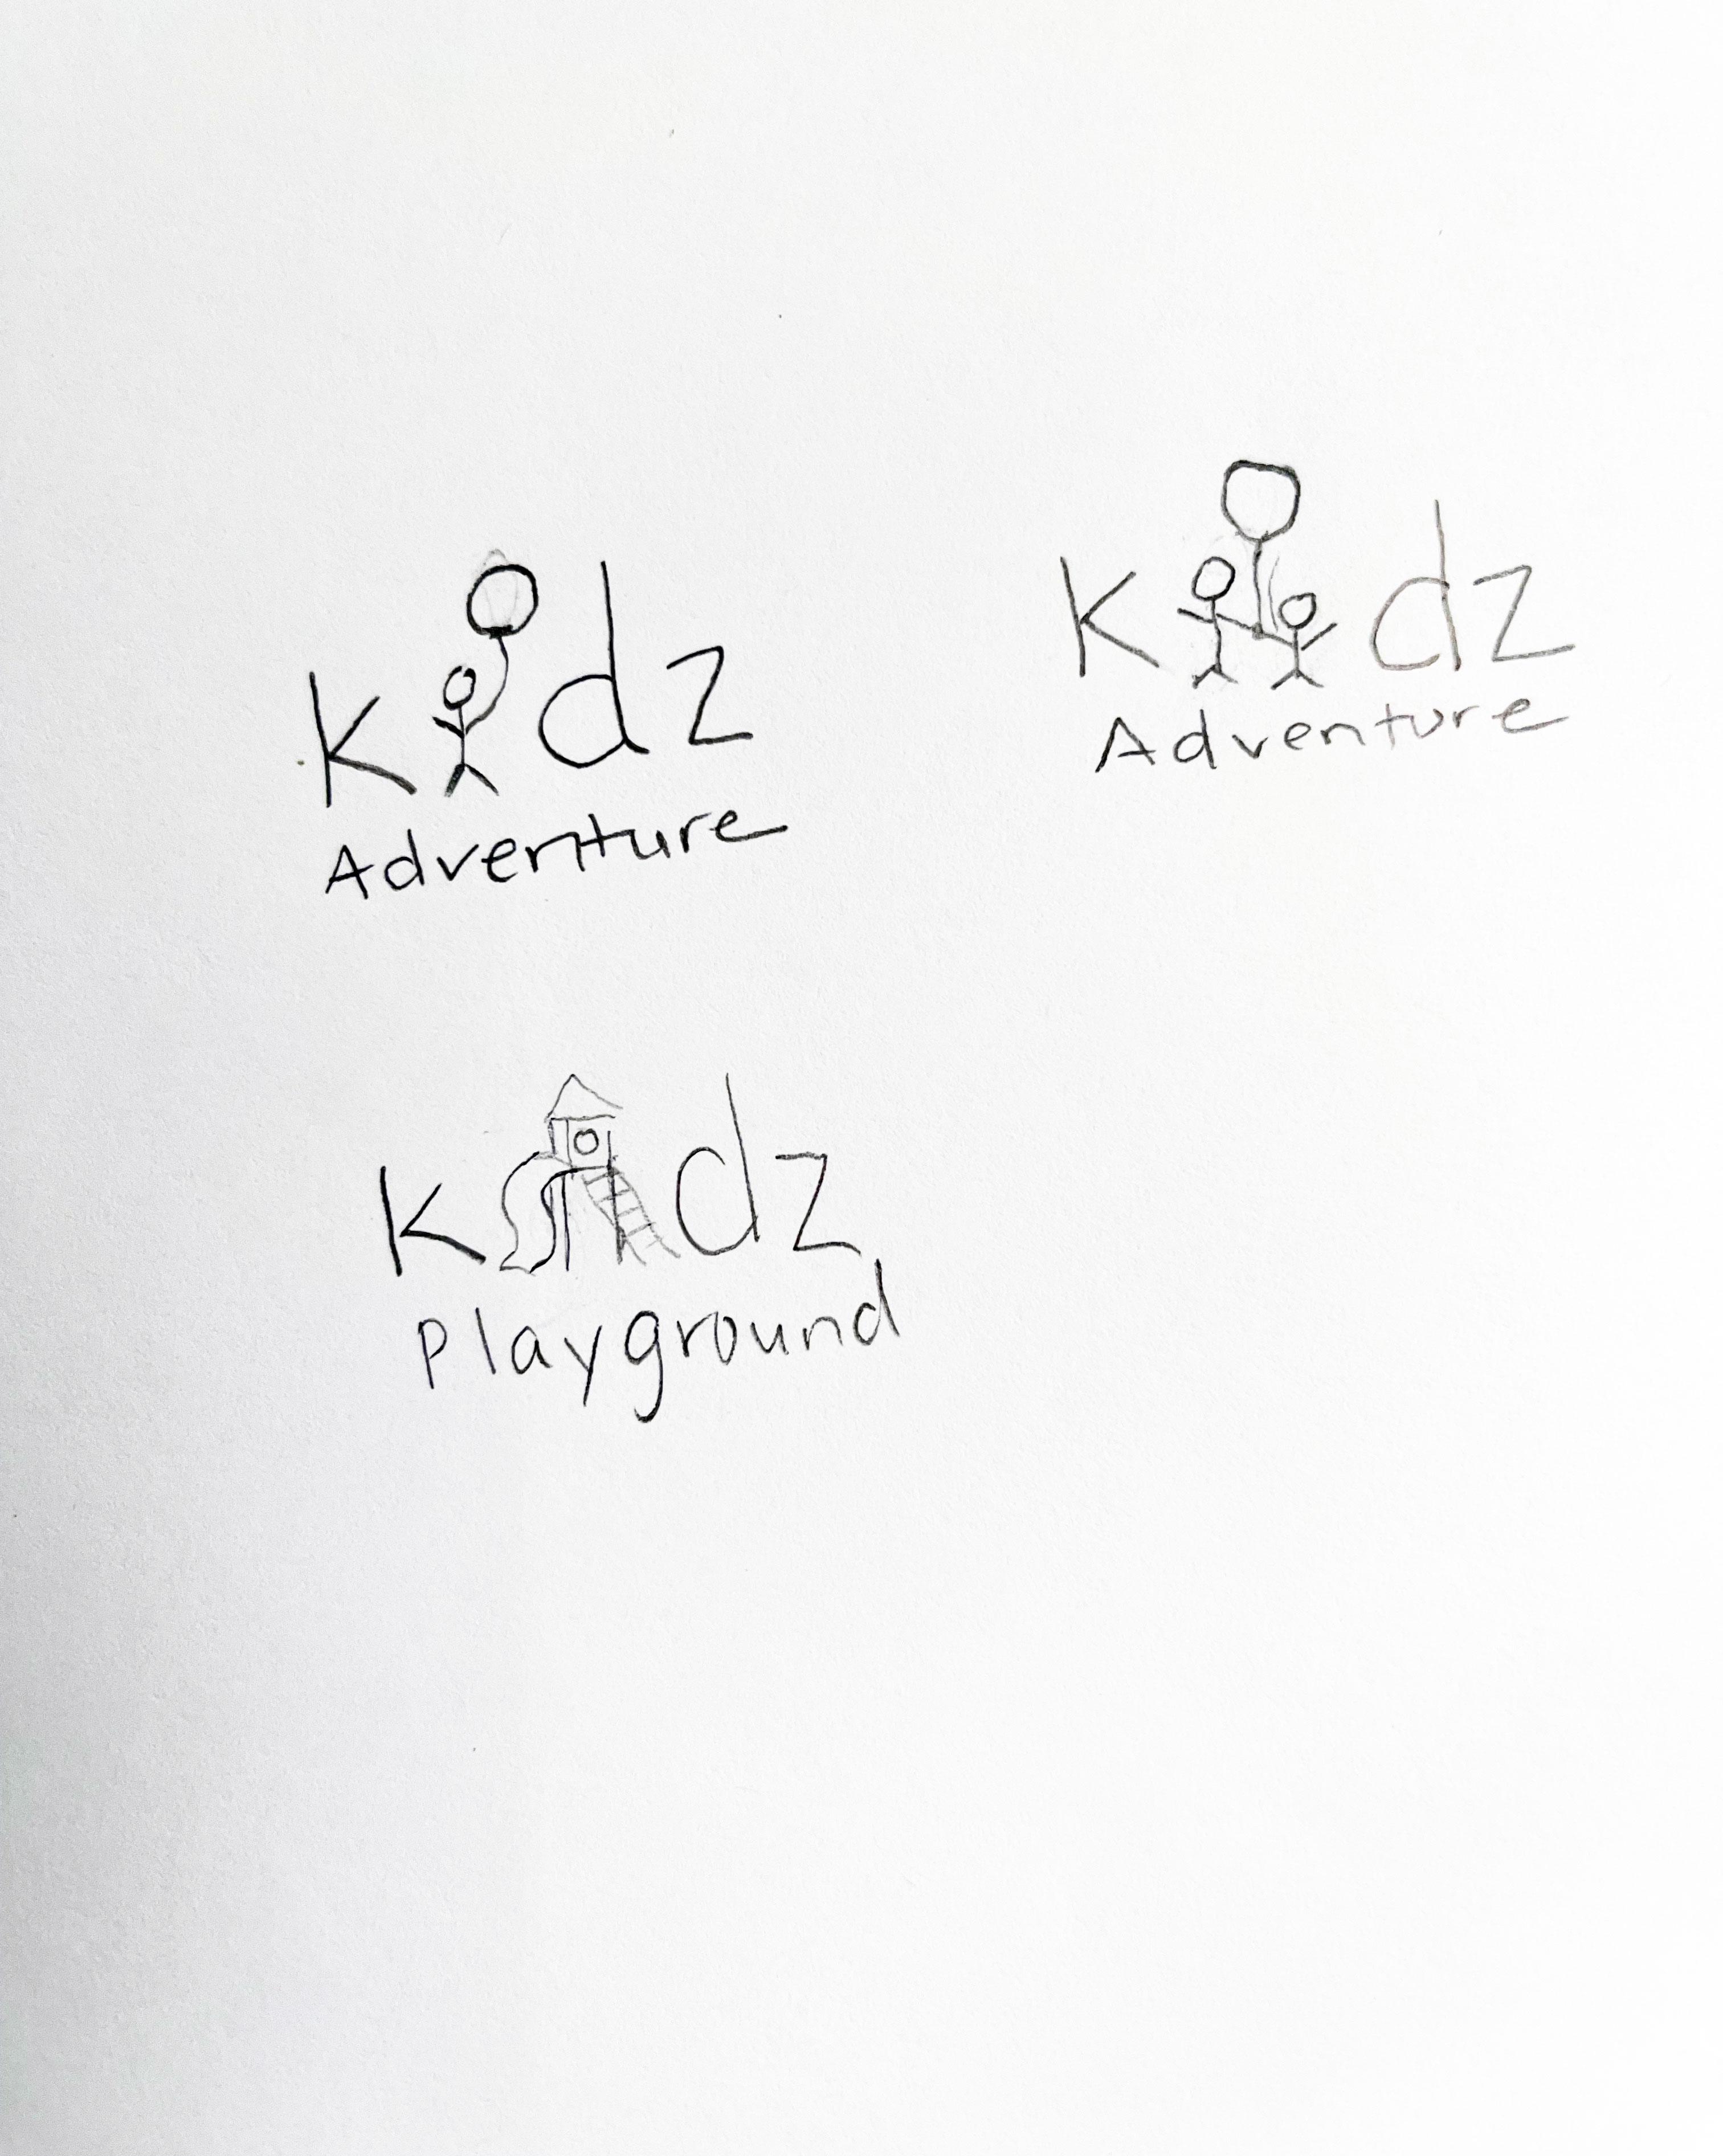 kidz logo sketches